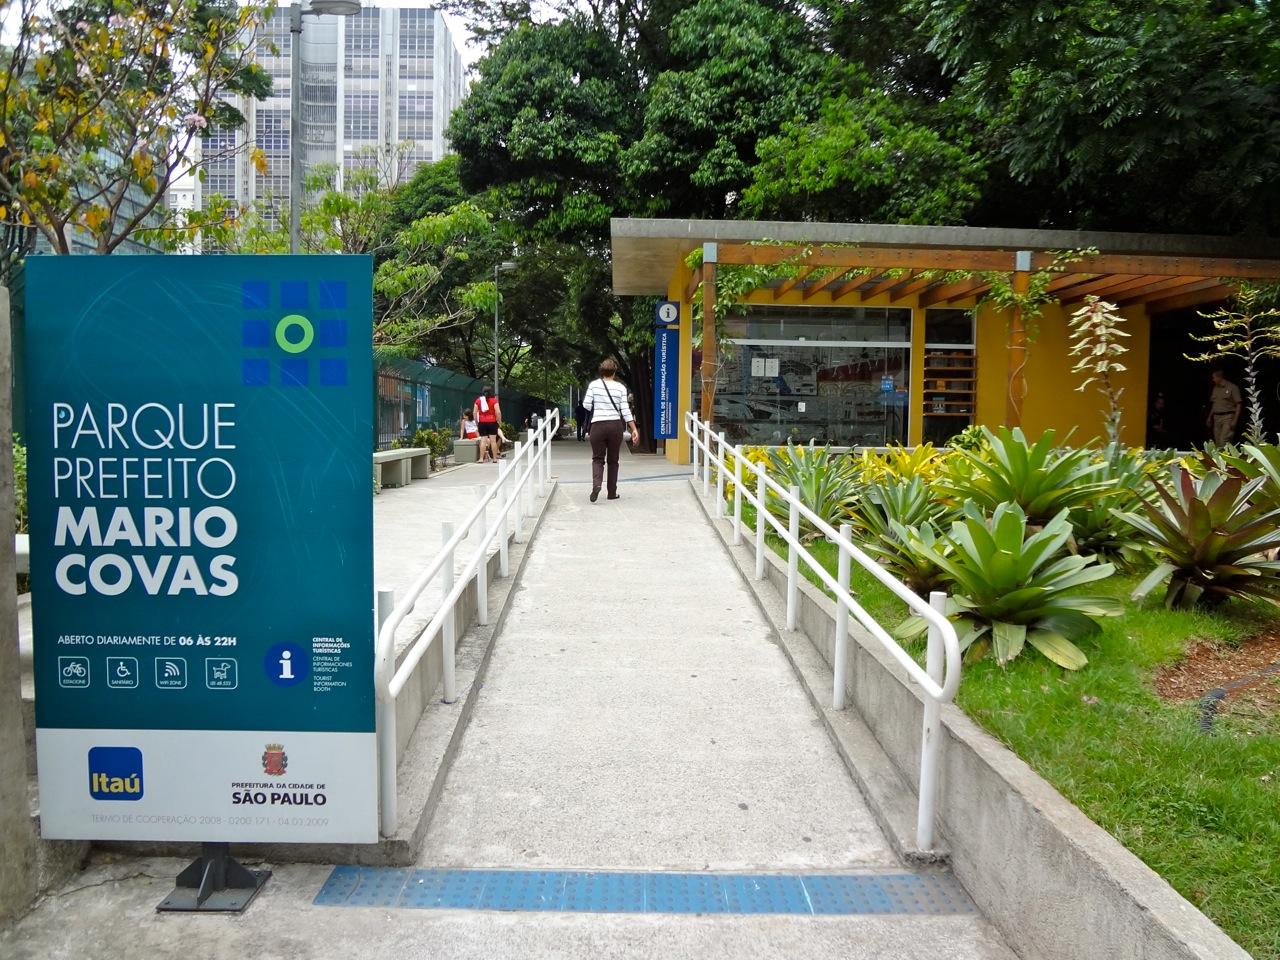 DSC00125 - Série Avenida Paulista: a Villa Fortunata e o parque. Como é o nome mesmo?